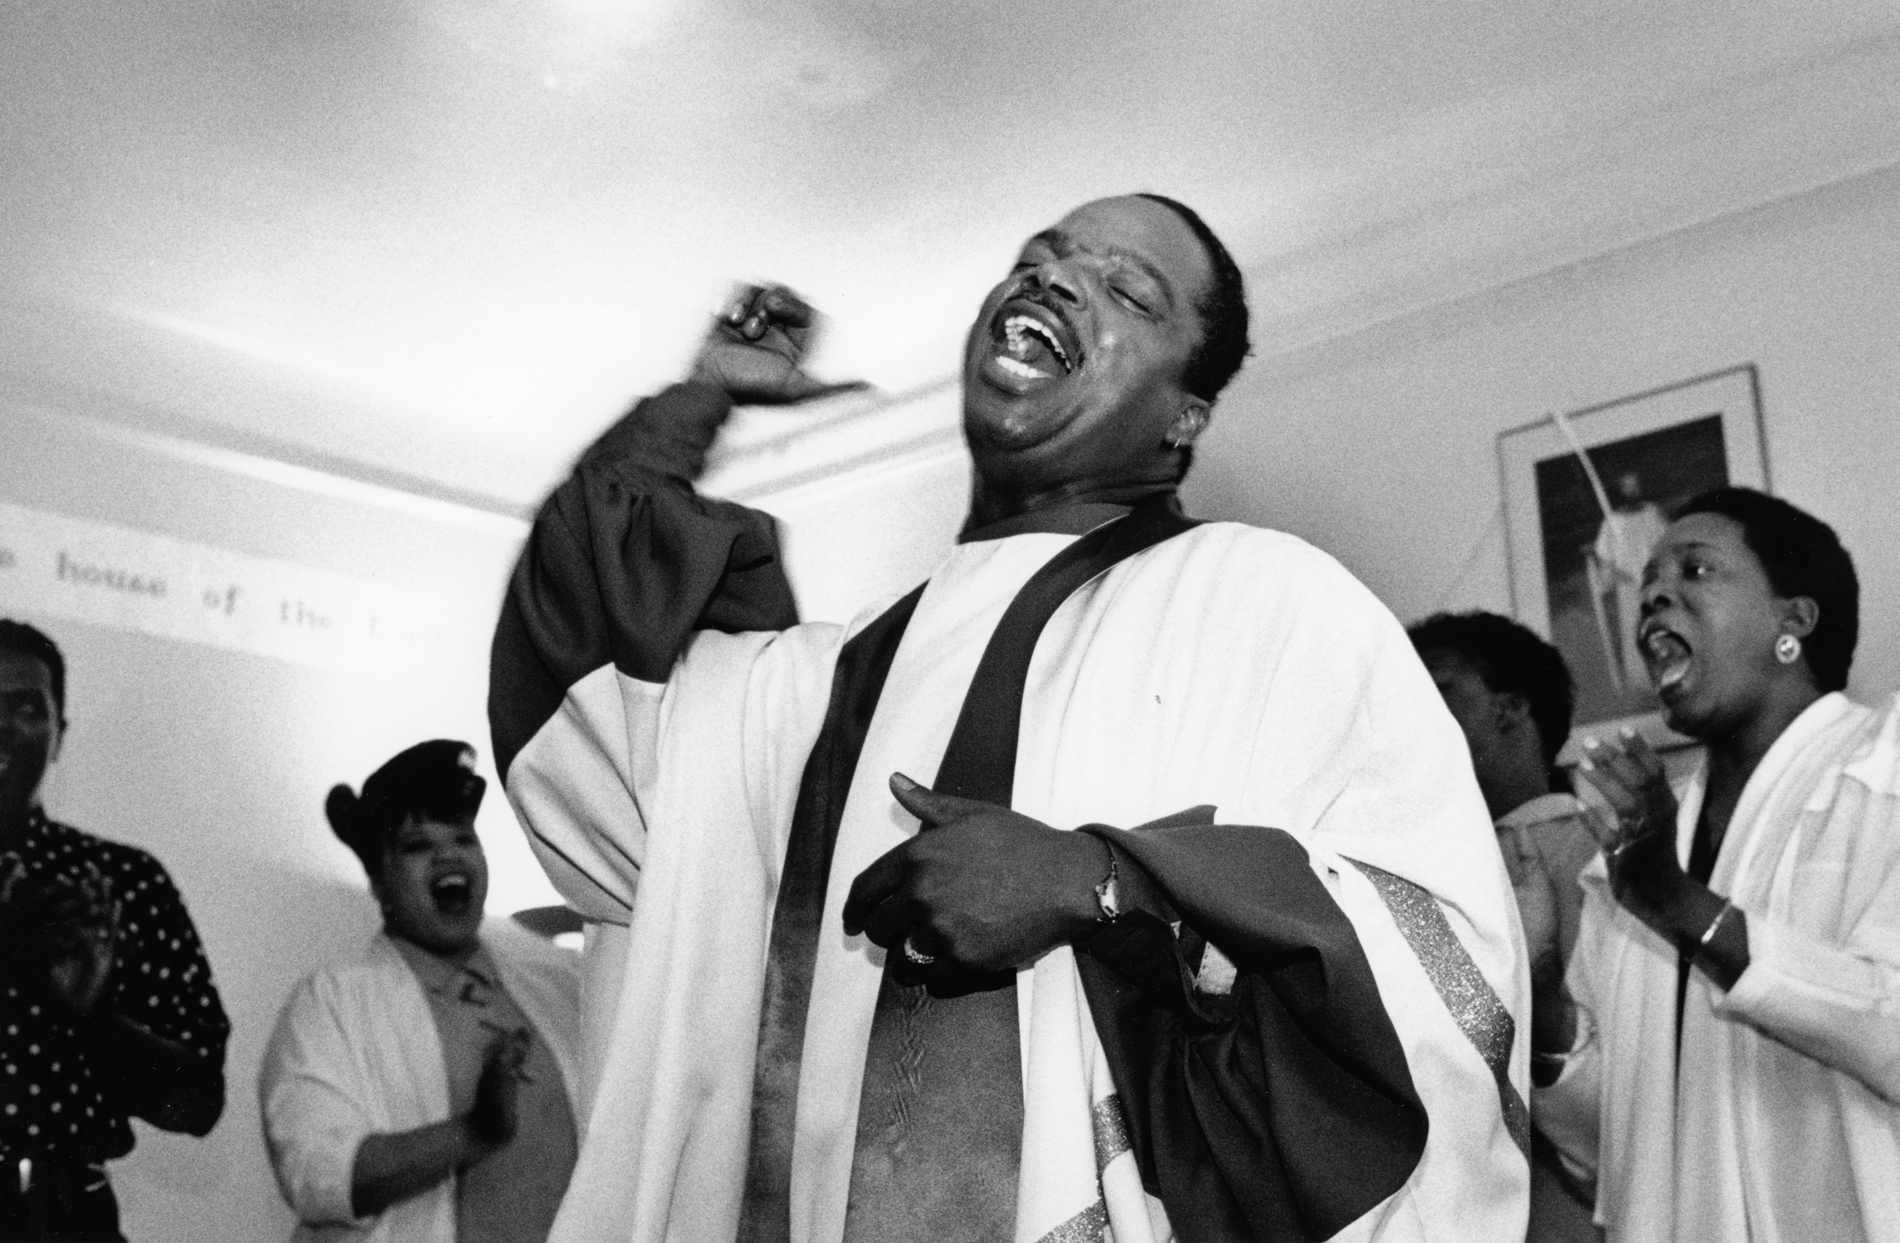 Full Truth Unity of Fellowship Christ Church, Detroit 1993.